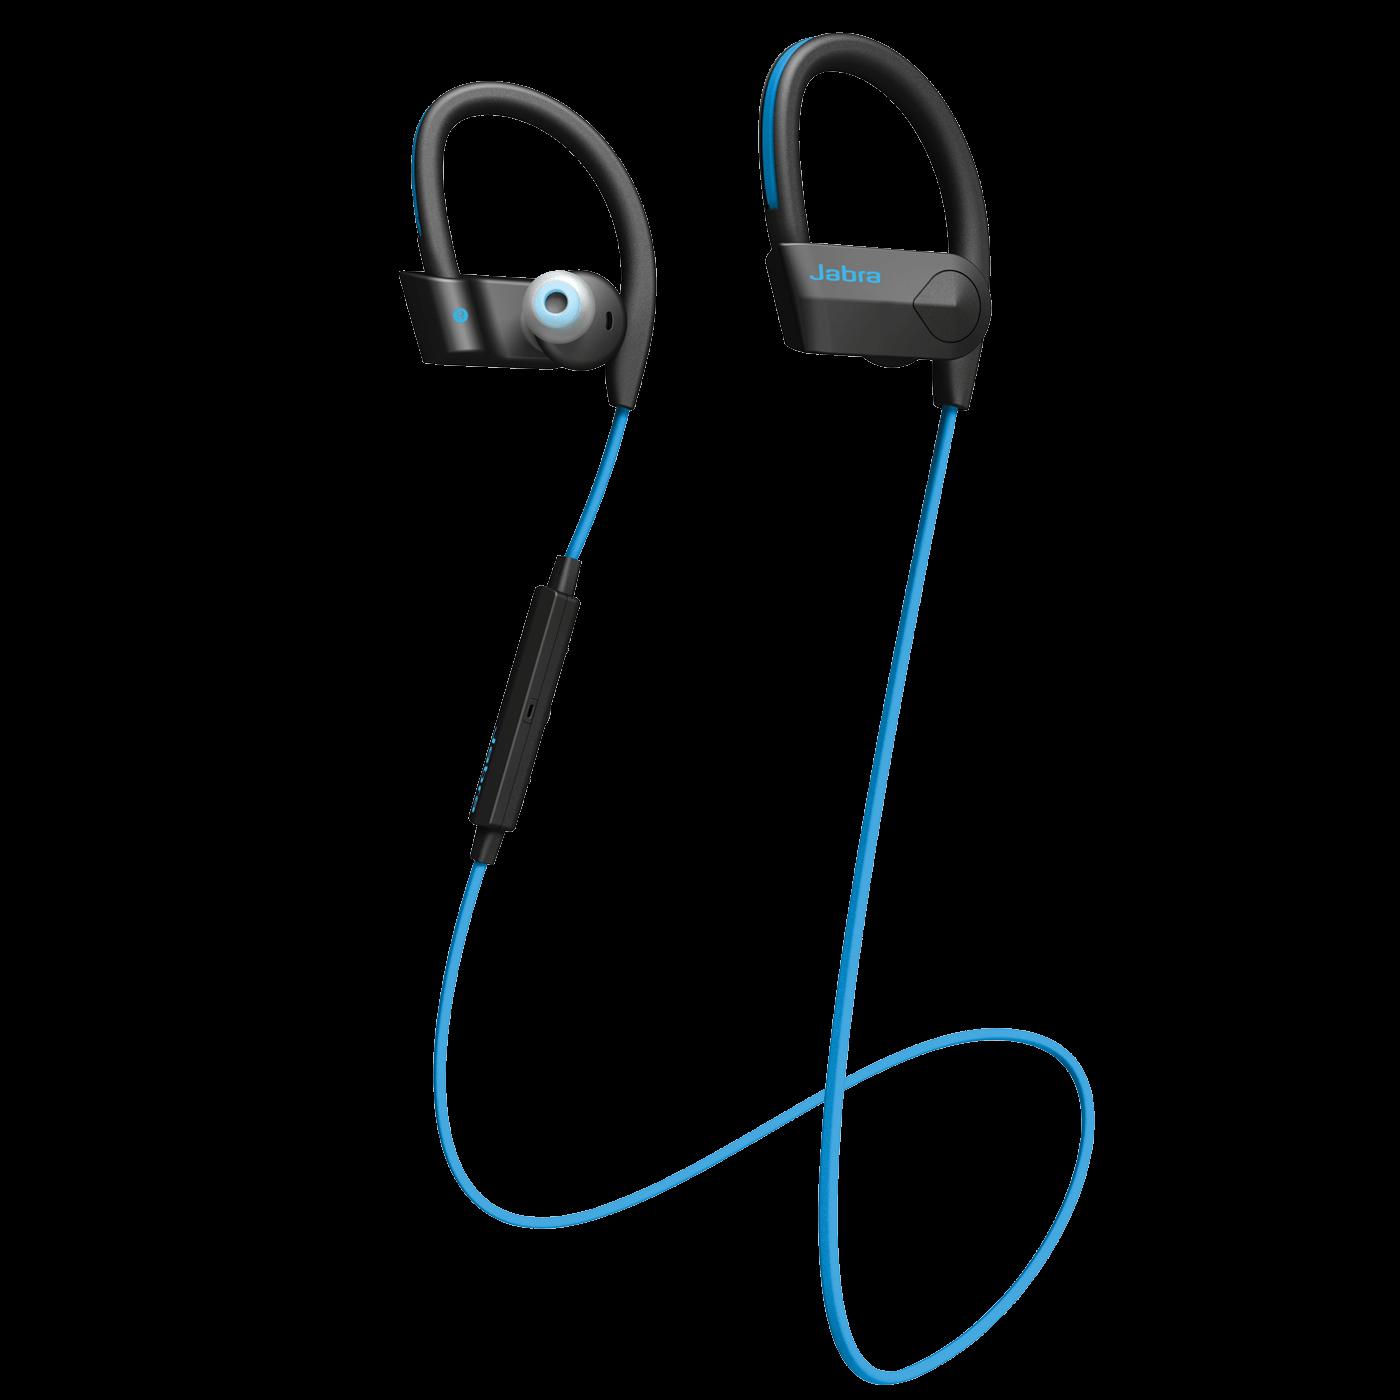 Jabra Sport Pace: Wireless neckband earphones for sporty dads, $168